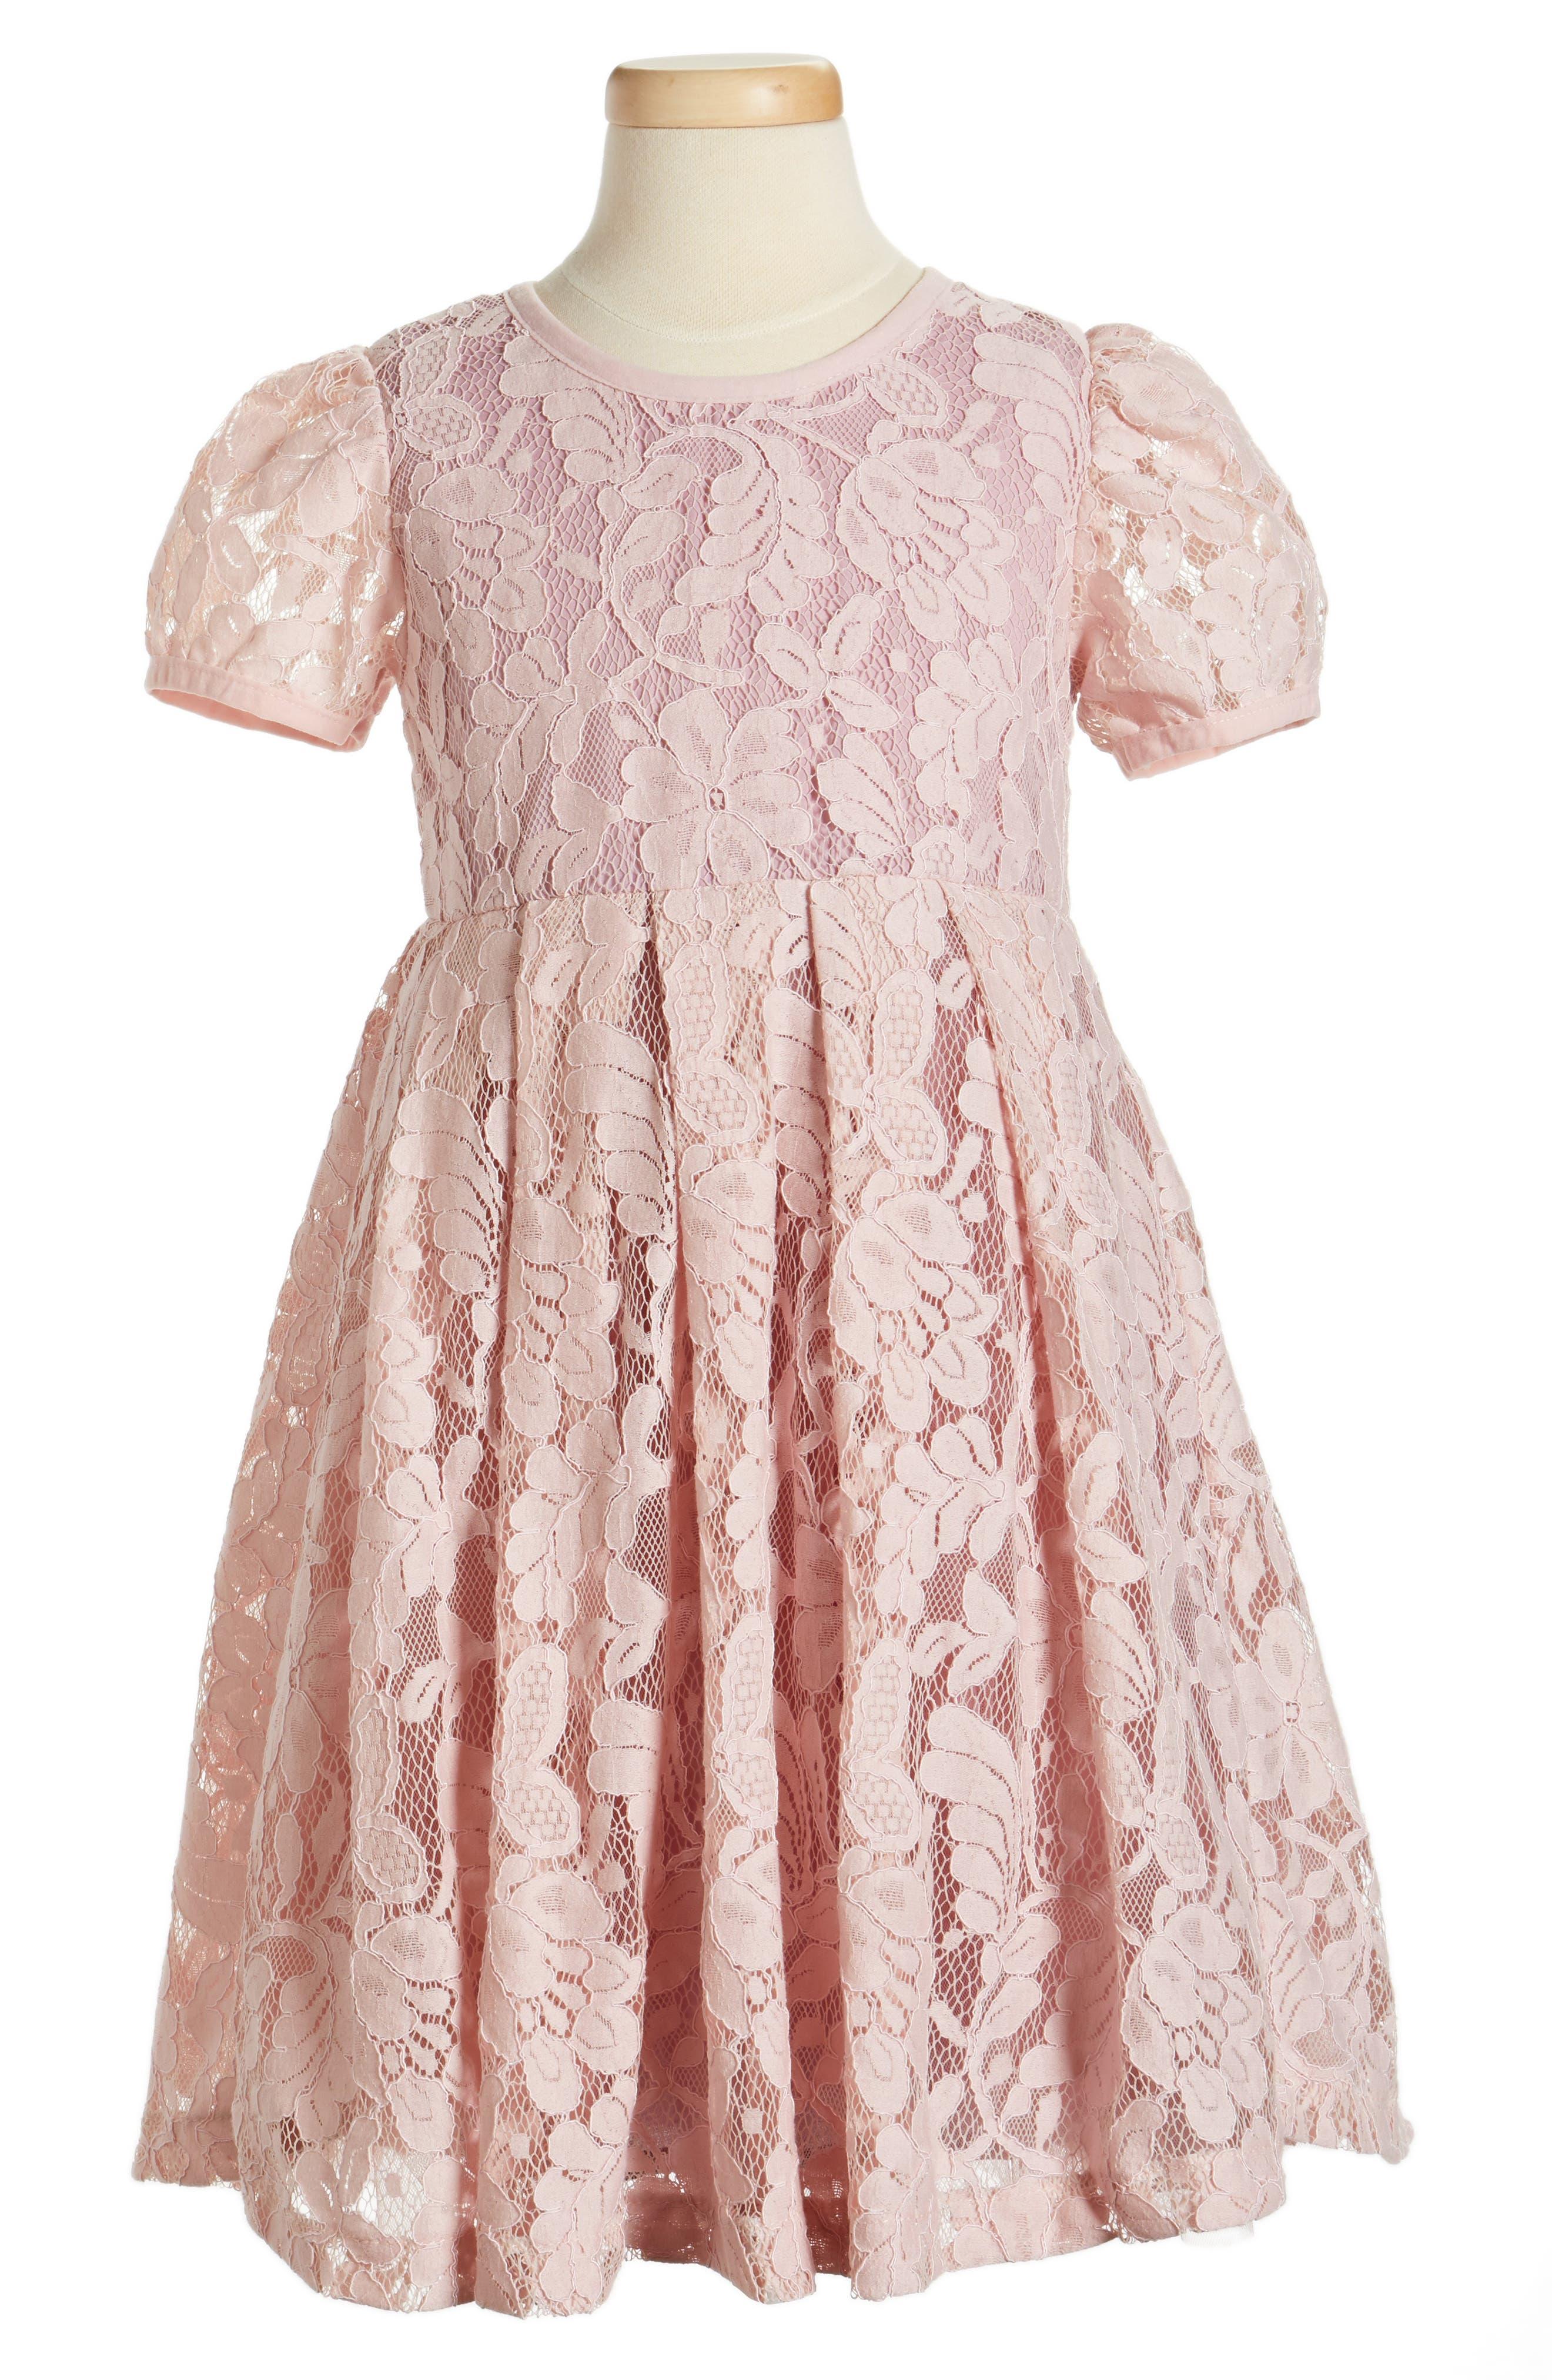 Alternate Image 1 Selected - Popatu Lace Dress (Toddler Girls, Little Girls & Big Girls)